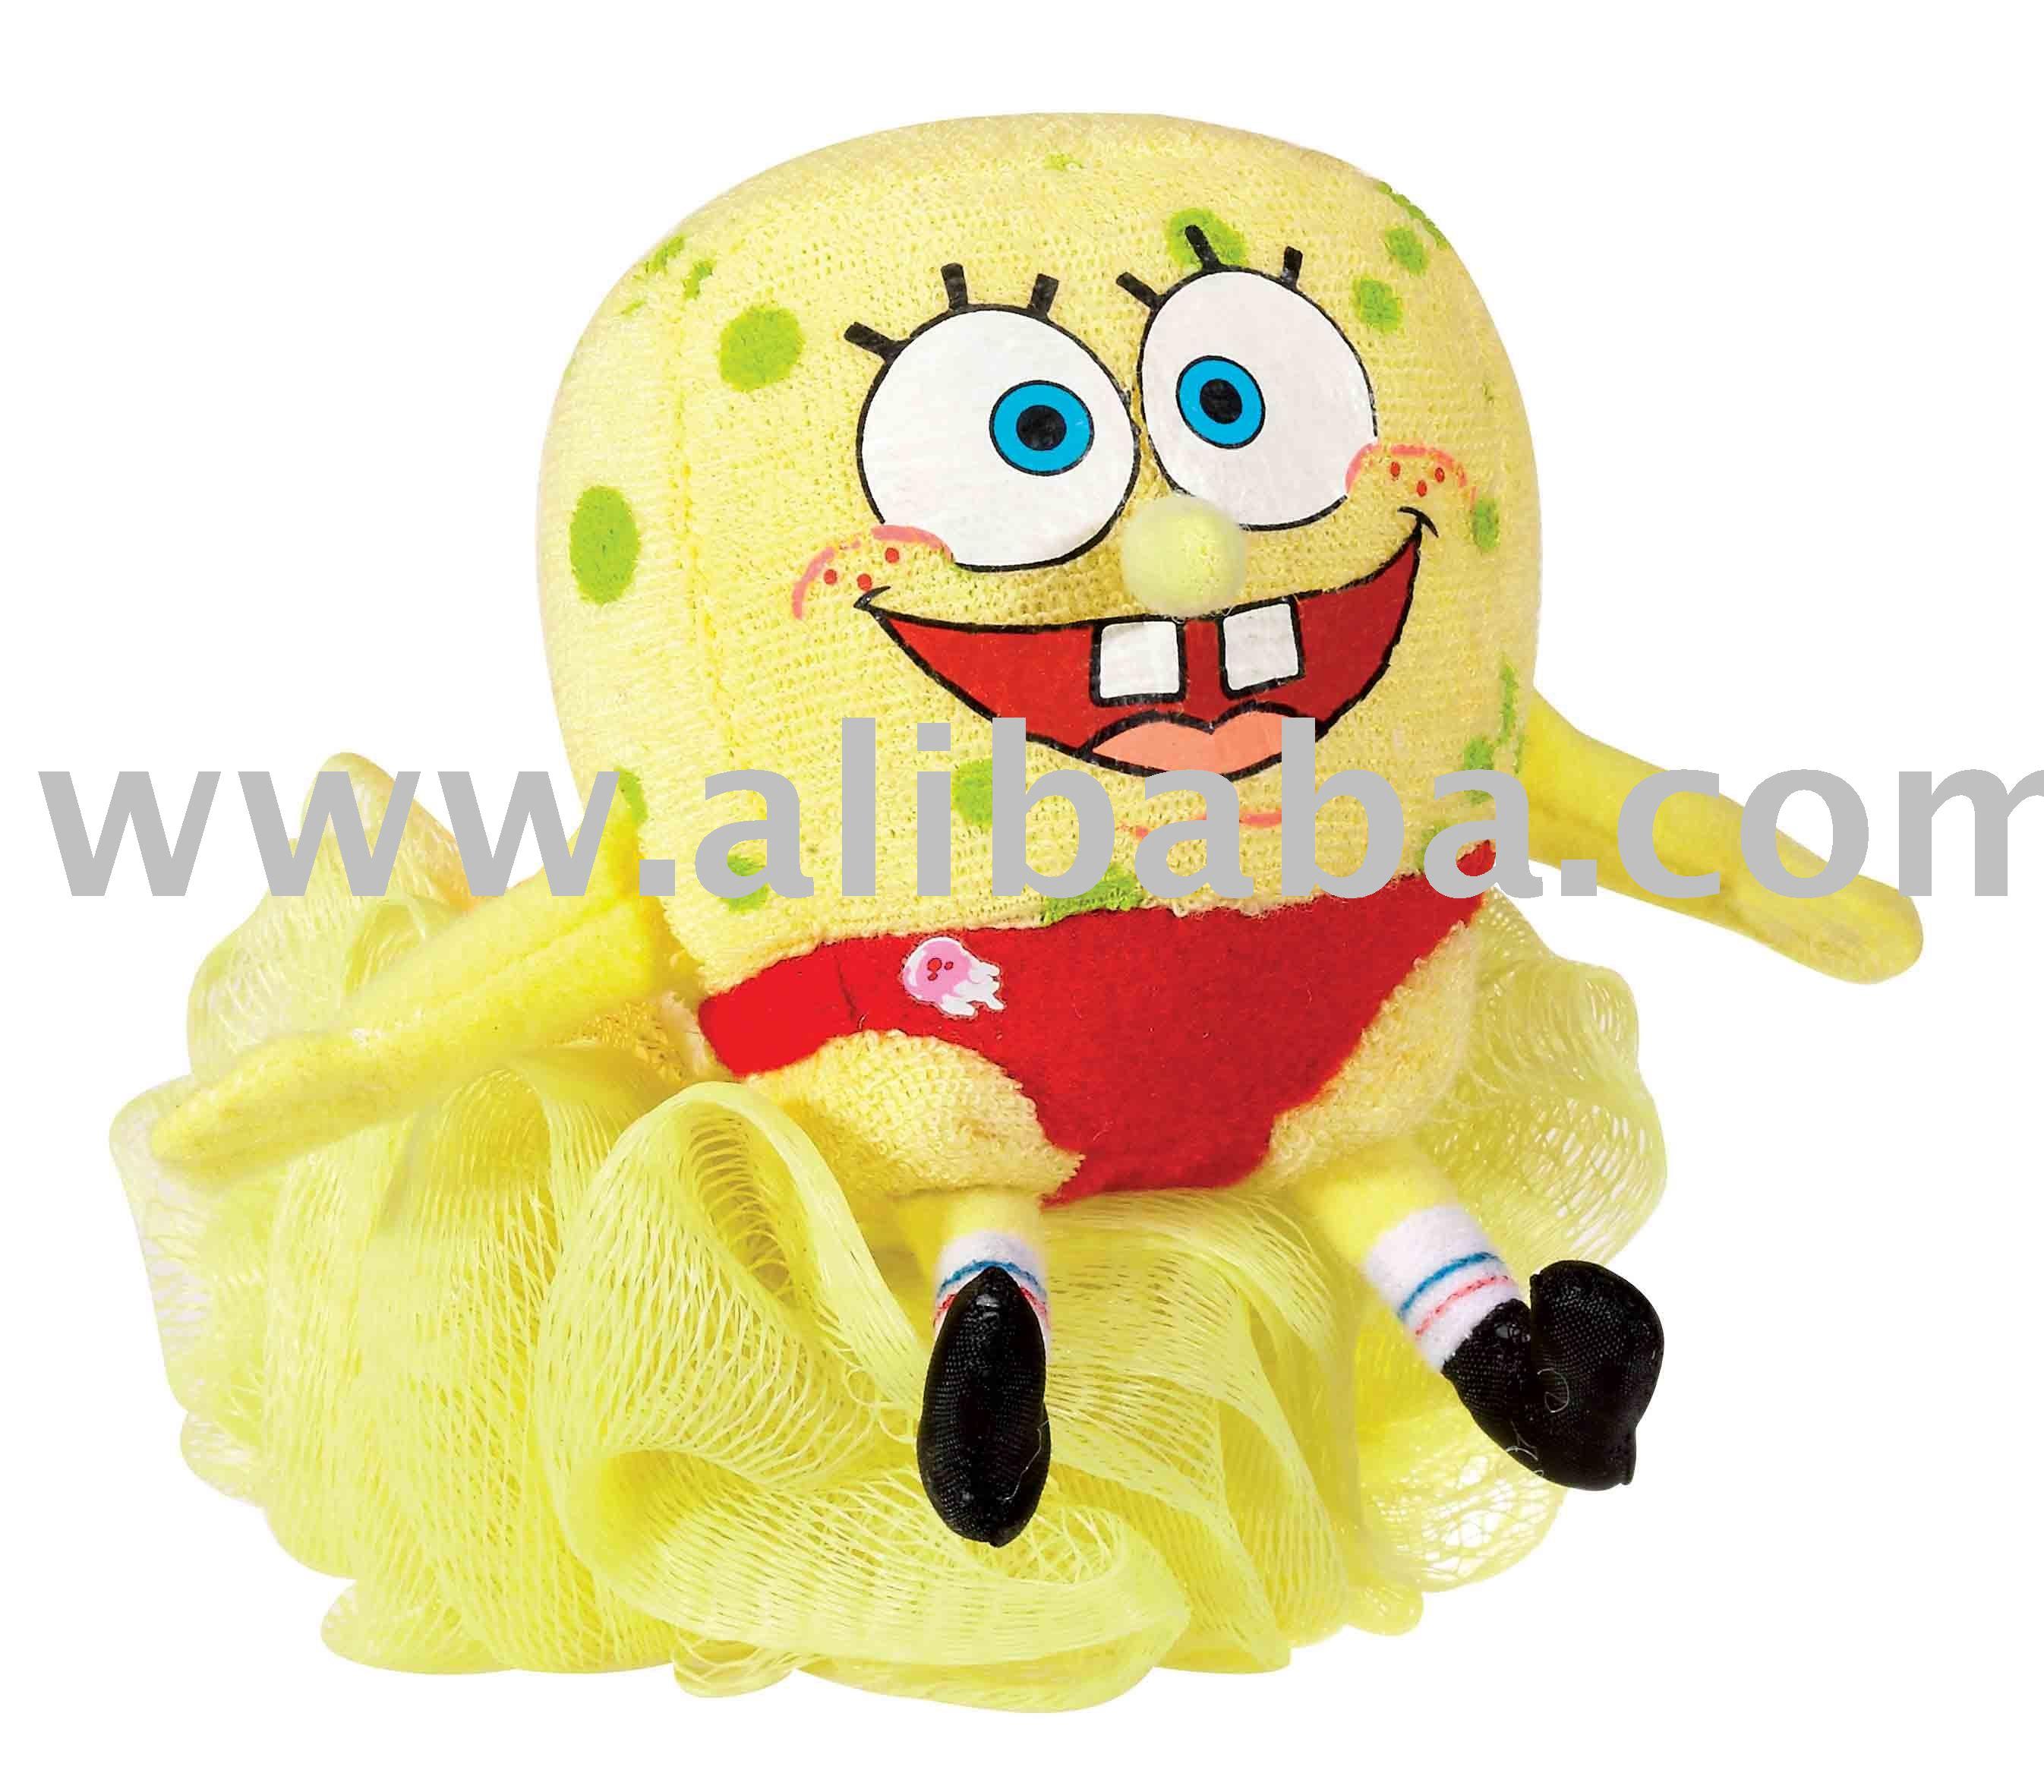 Spongebob squarepants bathroom accessories - Spongebob Bath Sponge Spongebob Bath Sponge Suppliers And Manufacturers At Alibaba Com